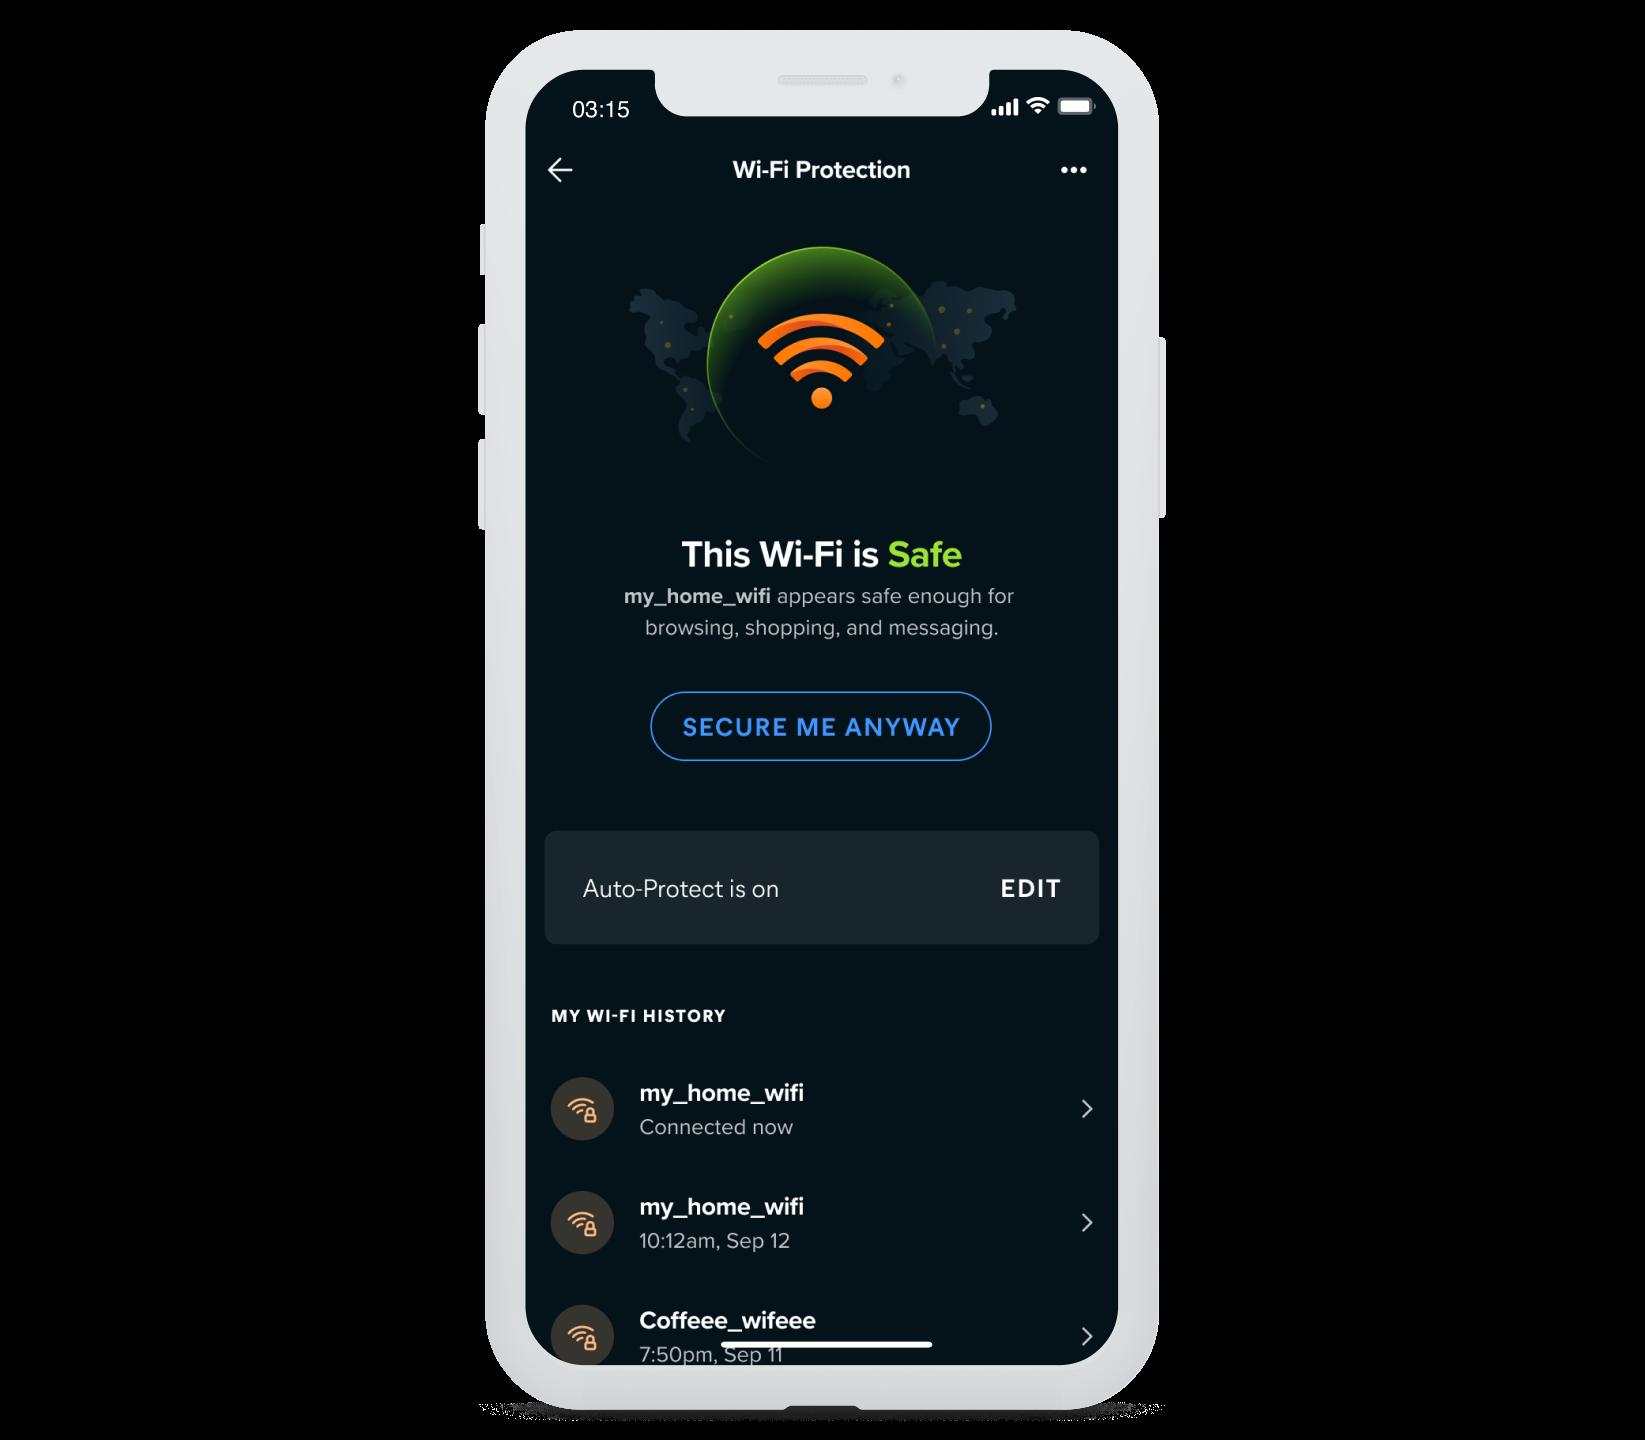 Easily verify Wi-Fi security